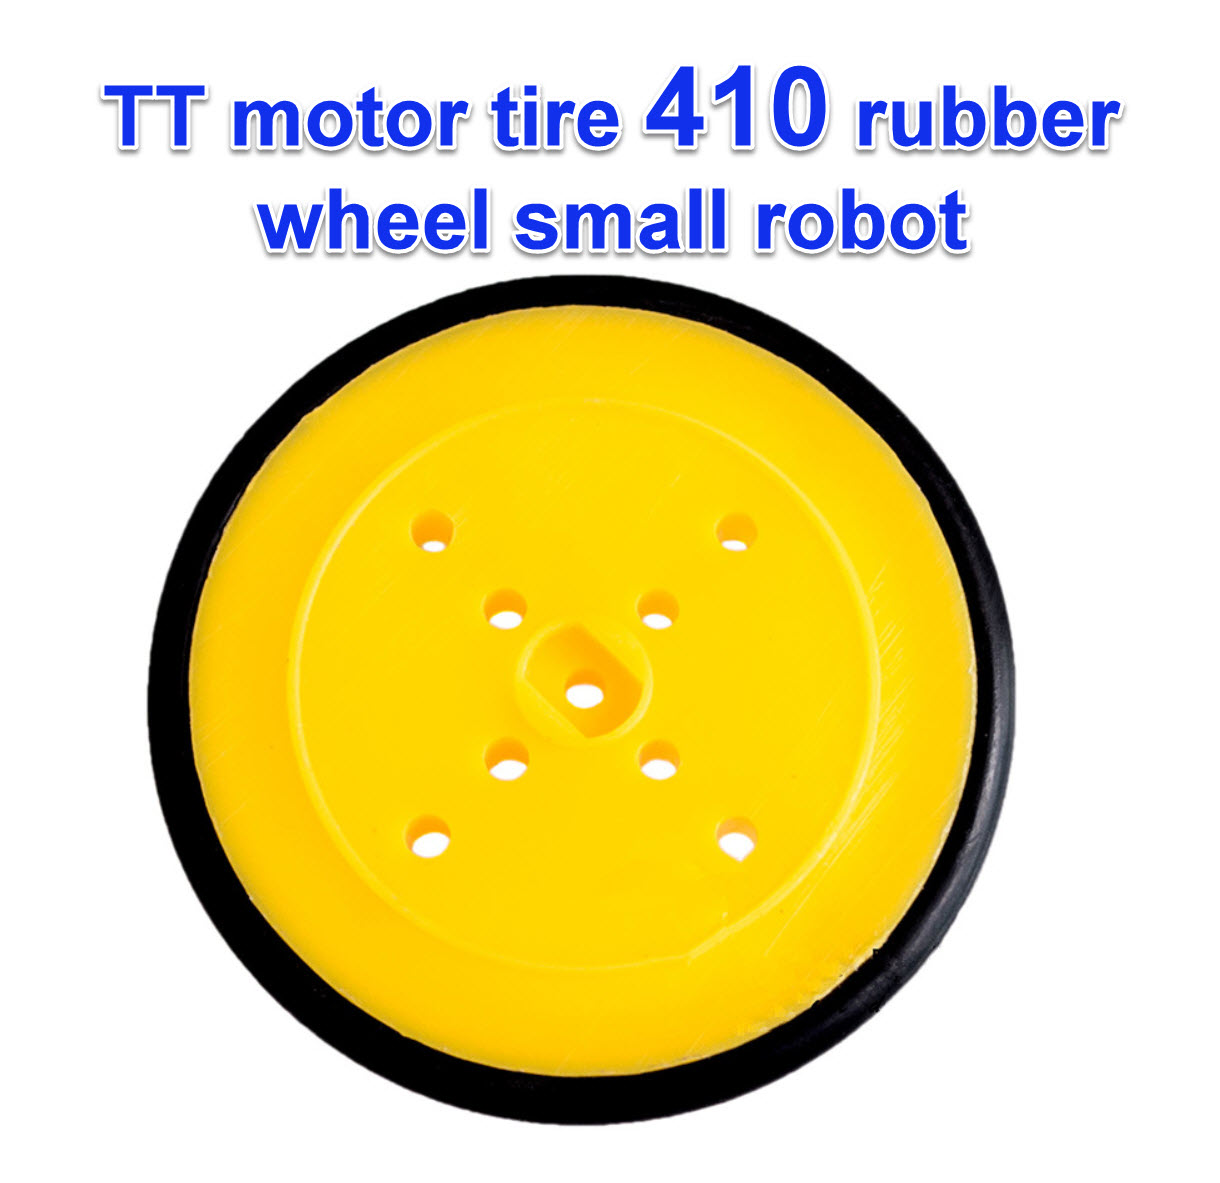 TT motor tire 410 rubber wheel small robot ล้อรถขนาดเล็ก